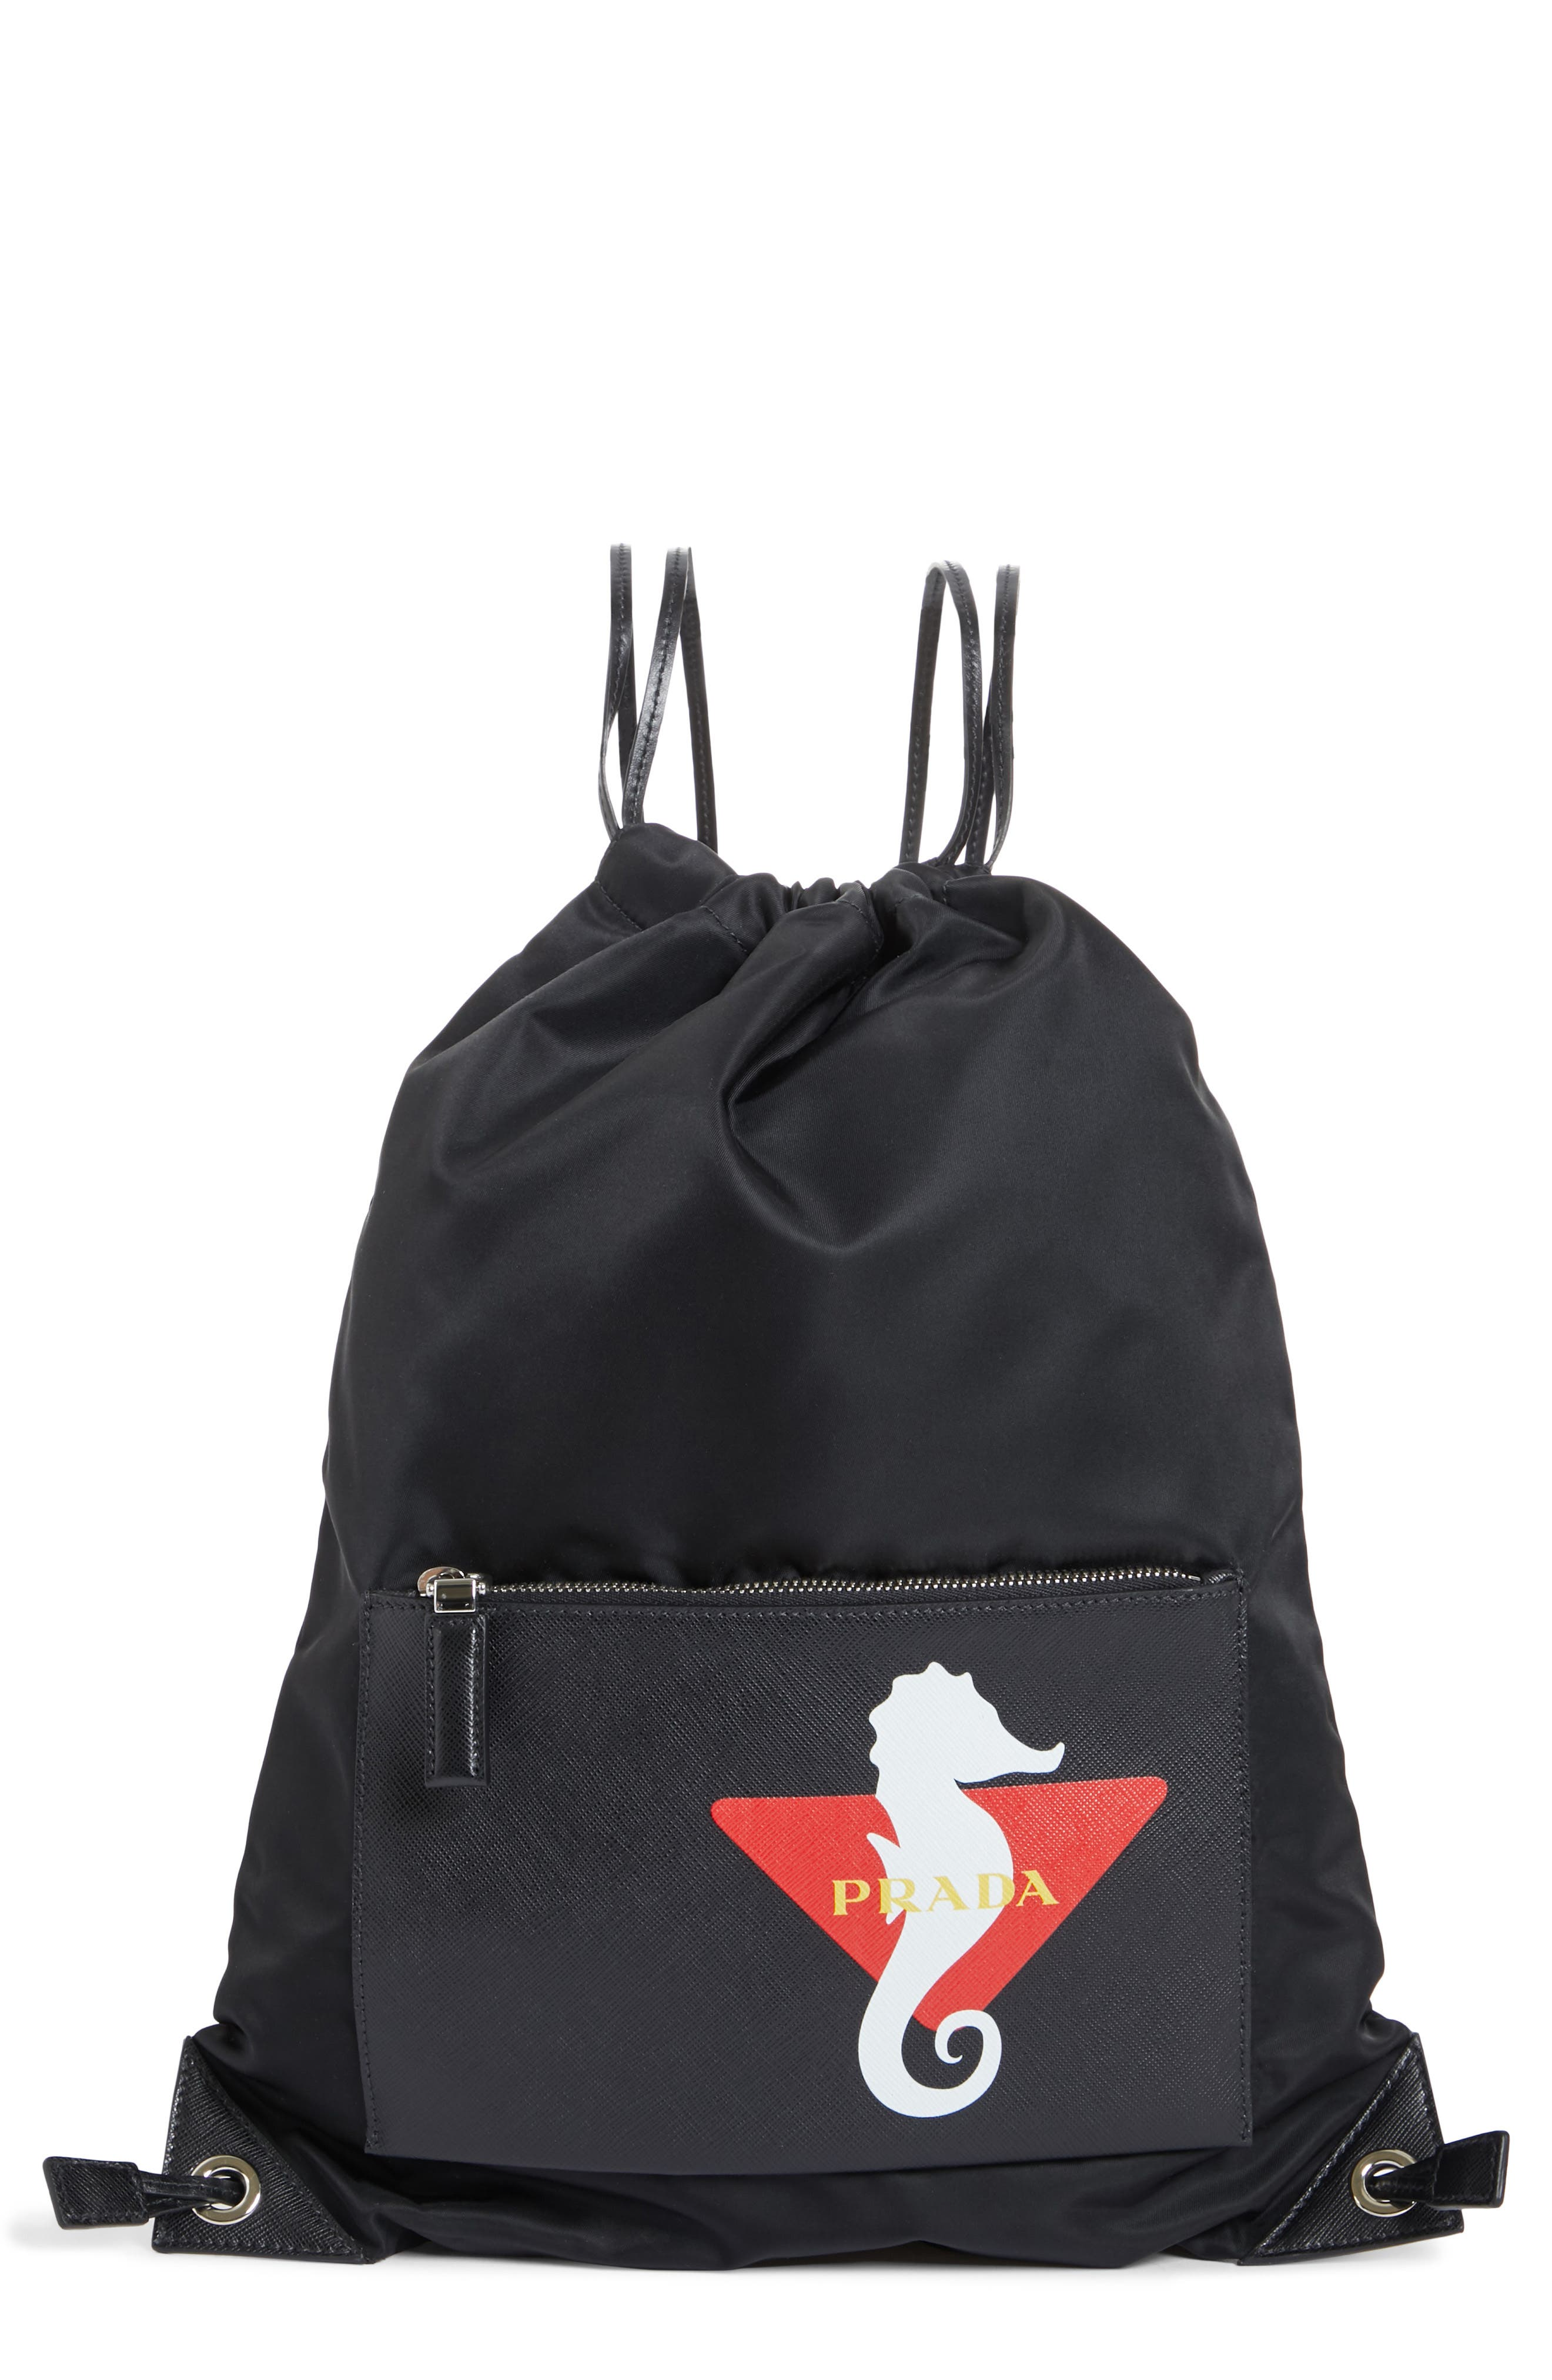 c1af0038c419 Men s Prada Bags   Backpacks